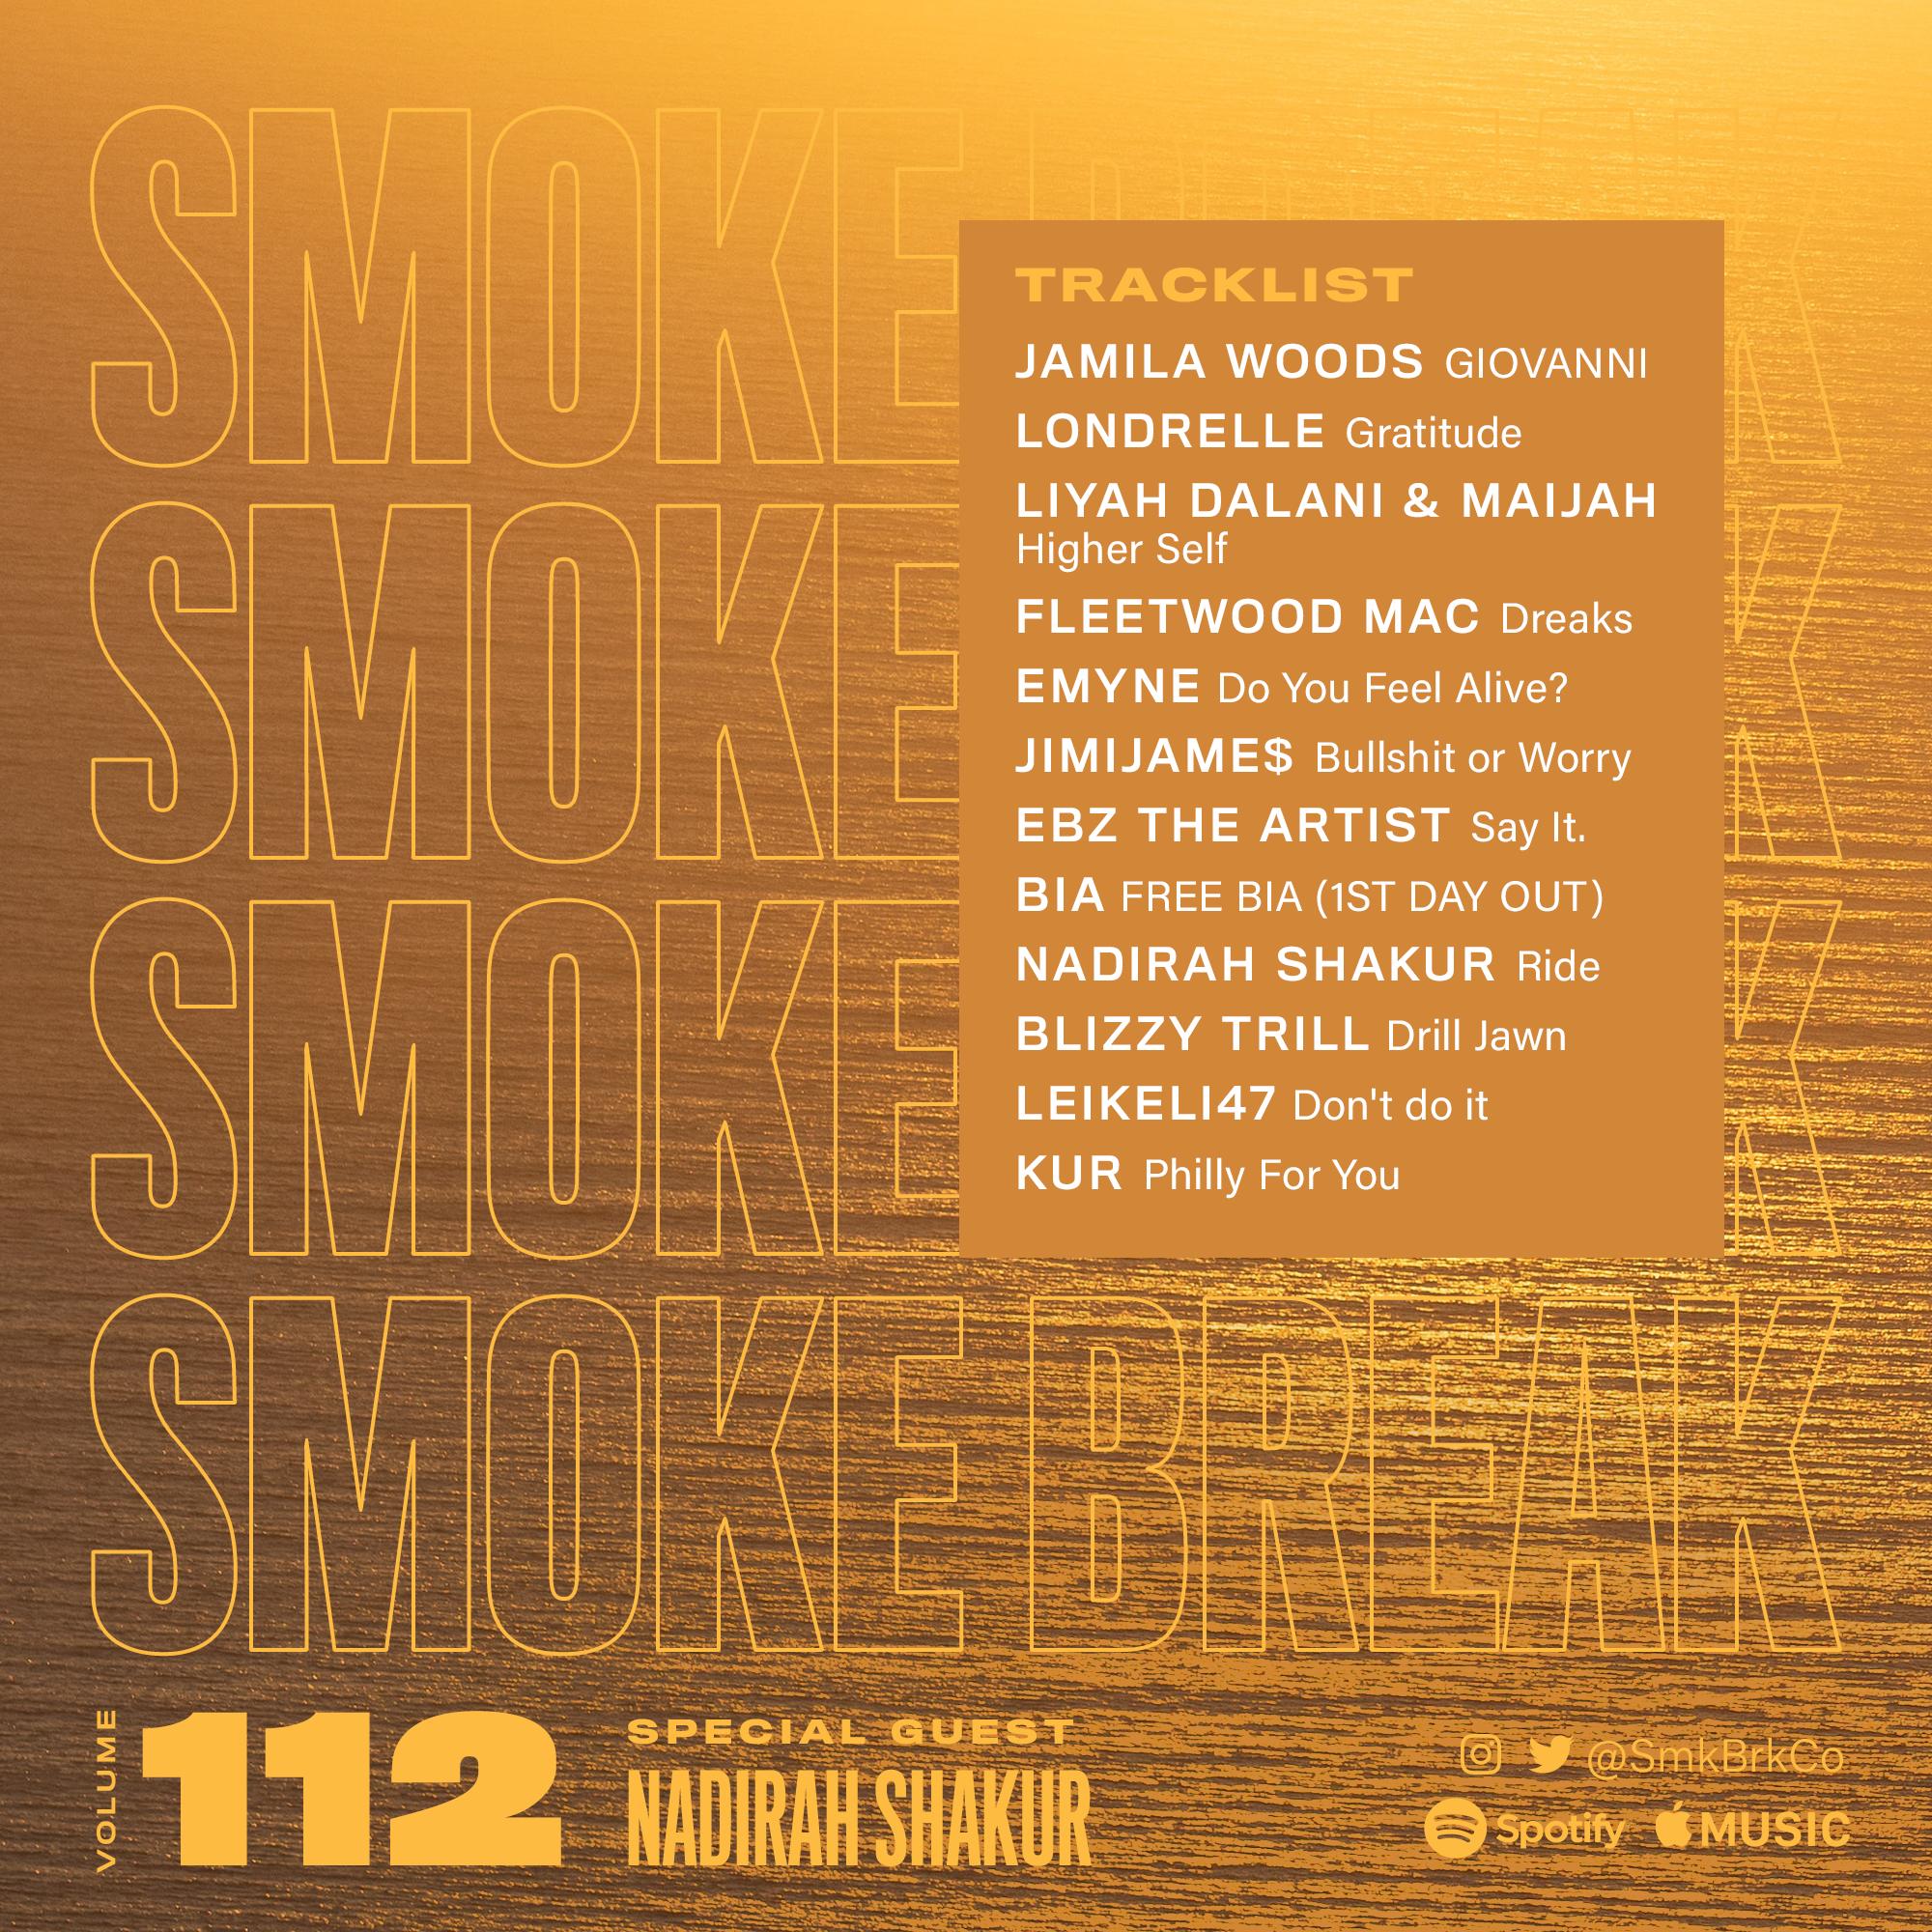 SMK BRK playlist vol 112 back cover nadirah shakur